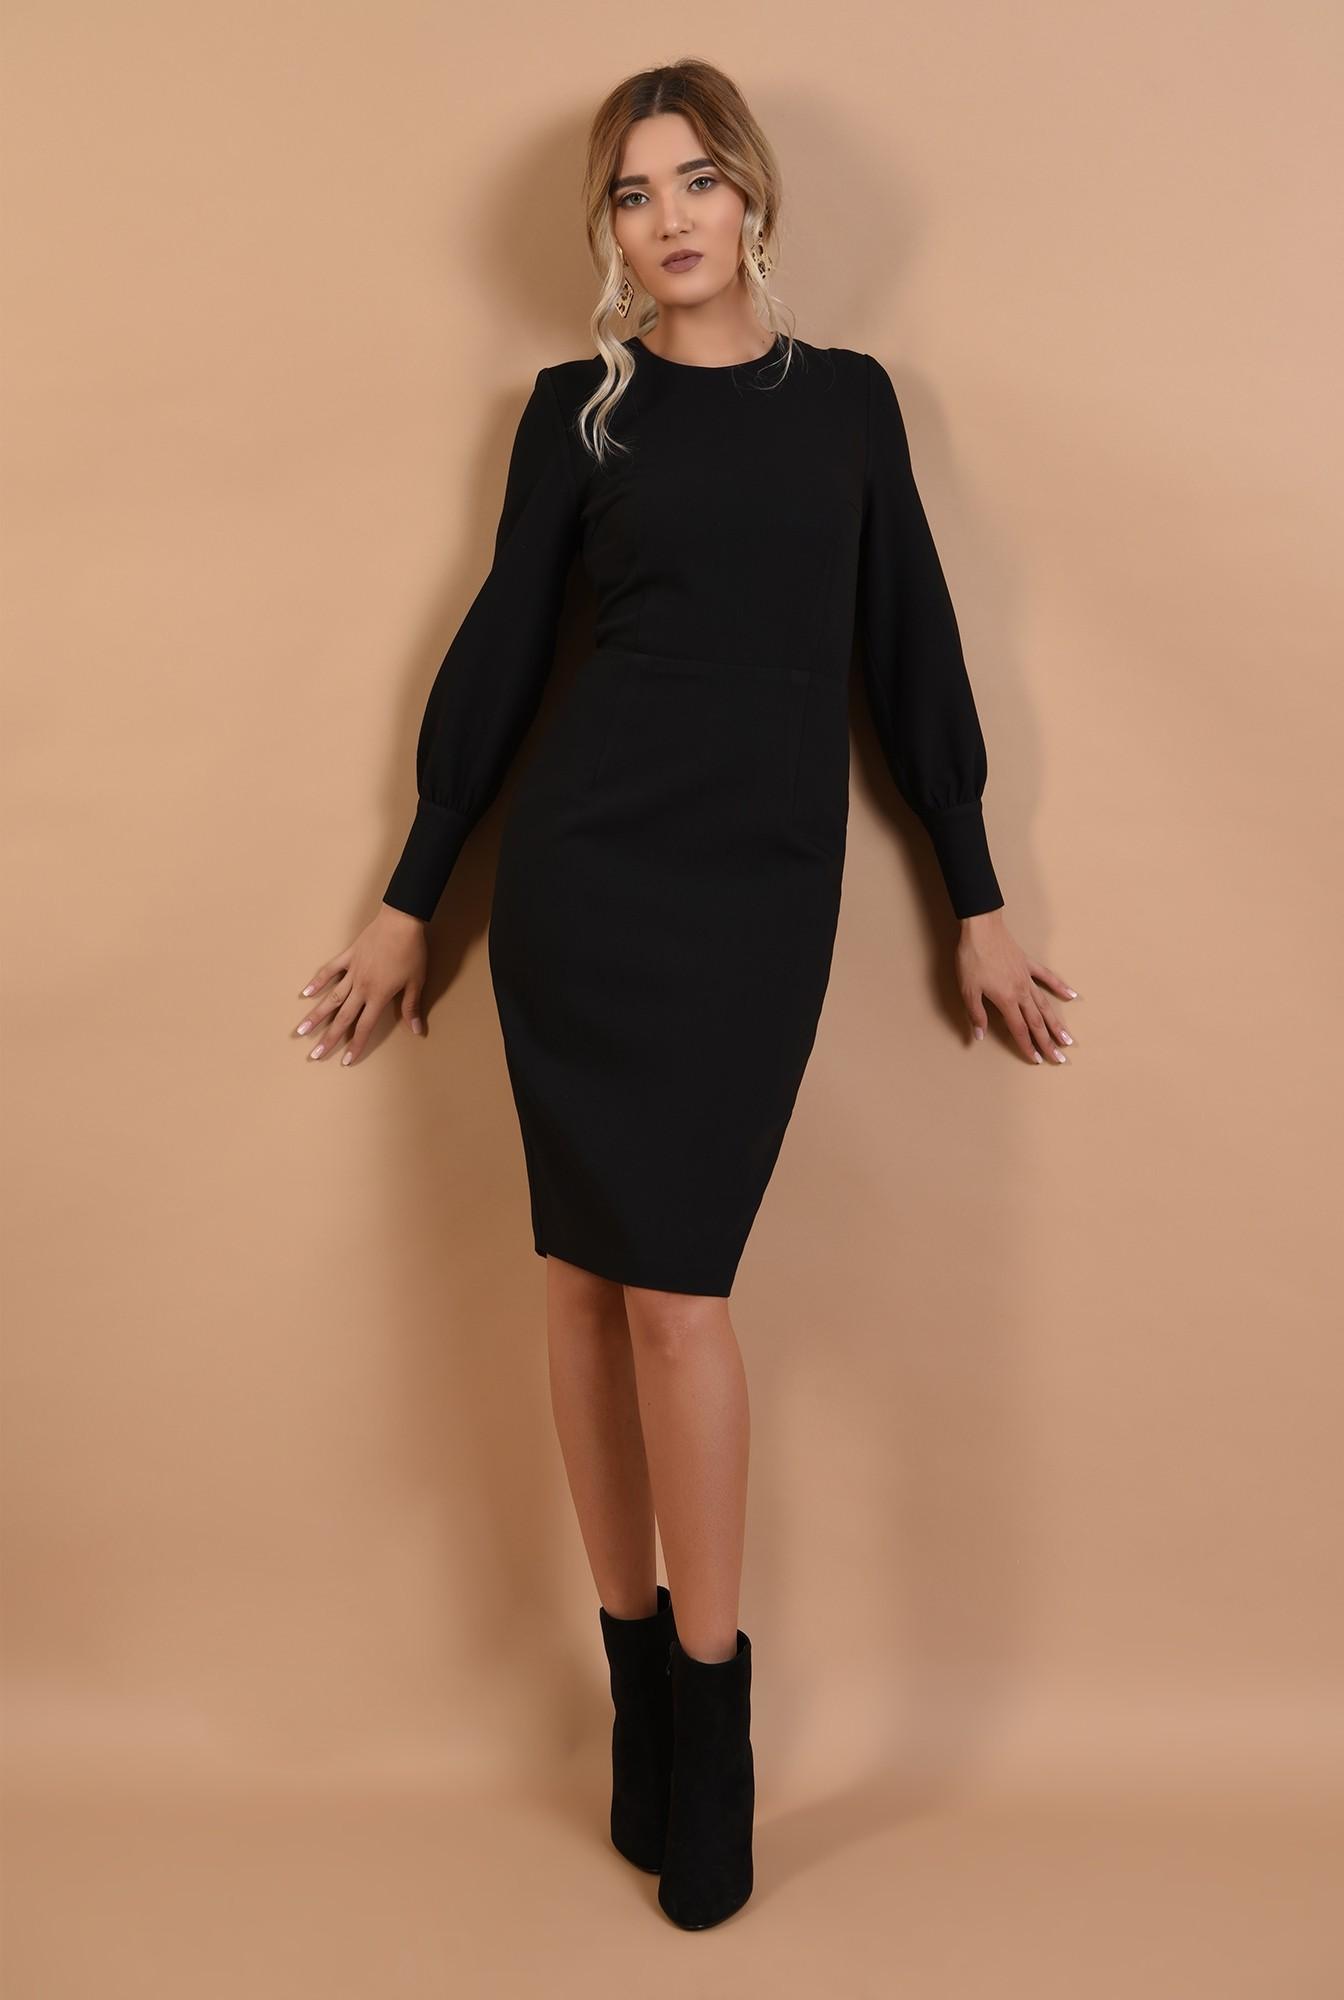 3 - rochie office, neagra, conica, lungime midi, mansete cu nasturi perla